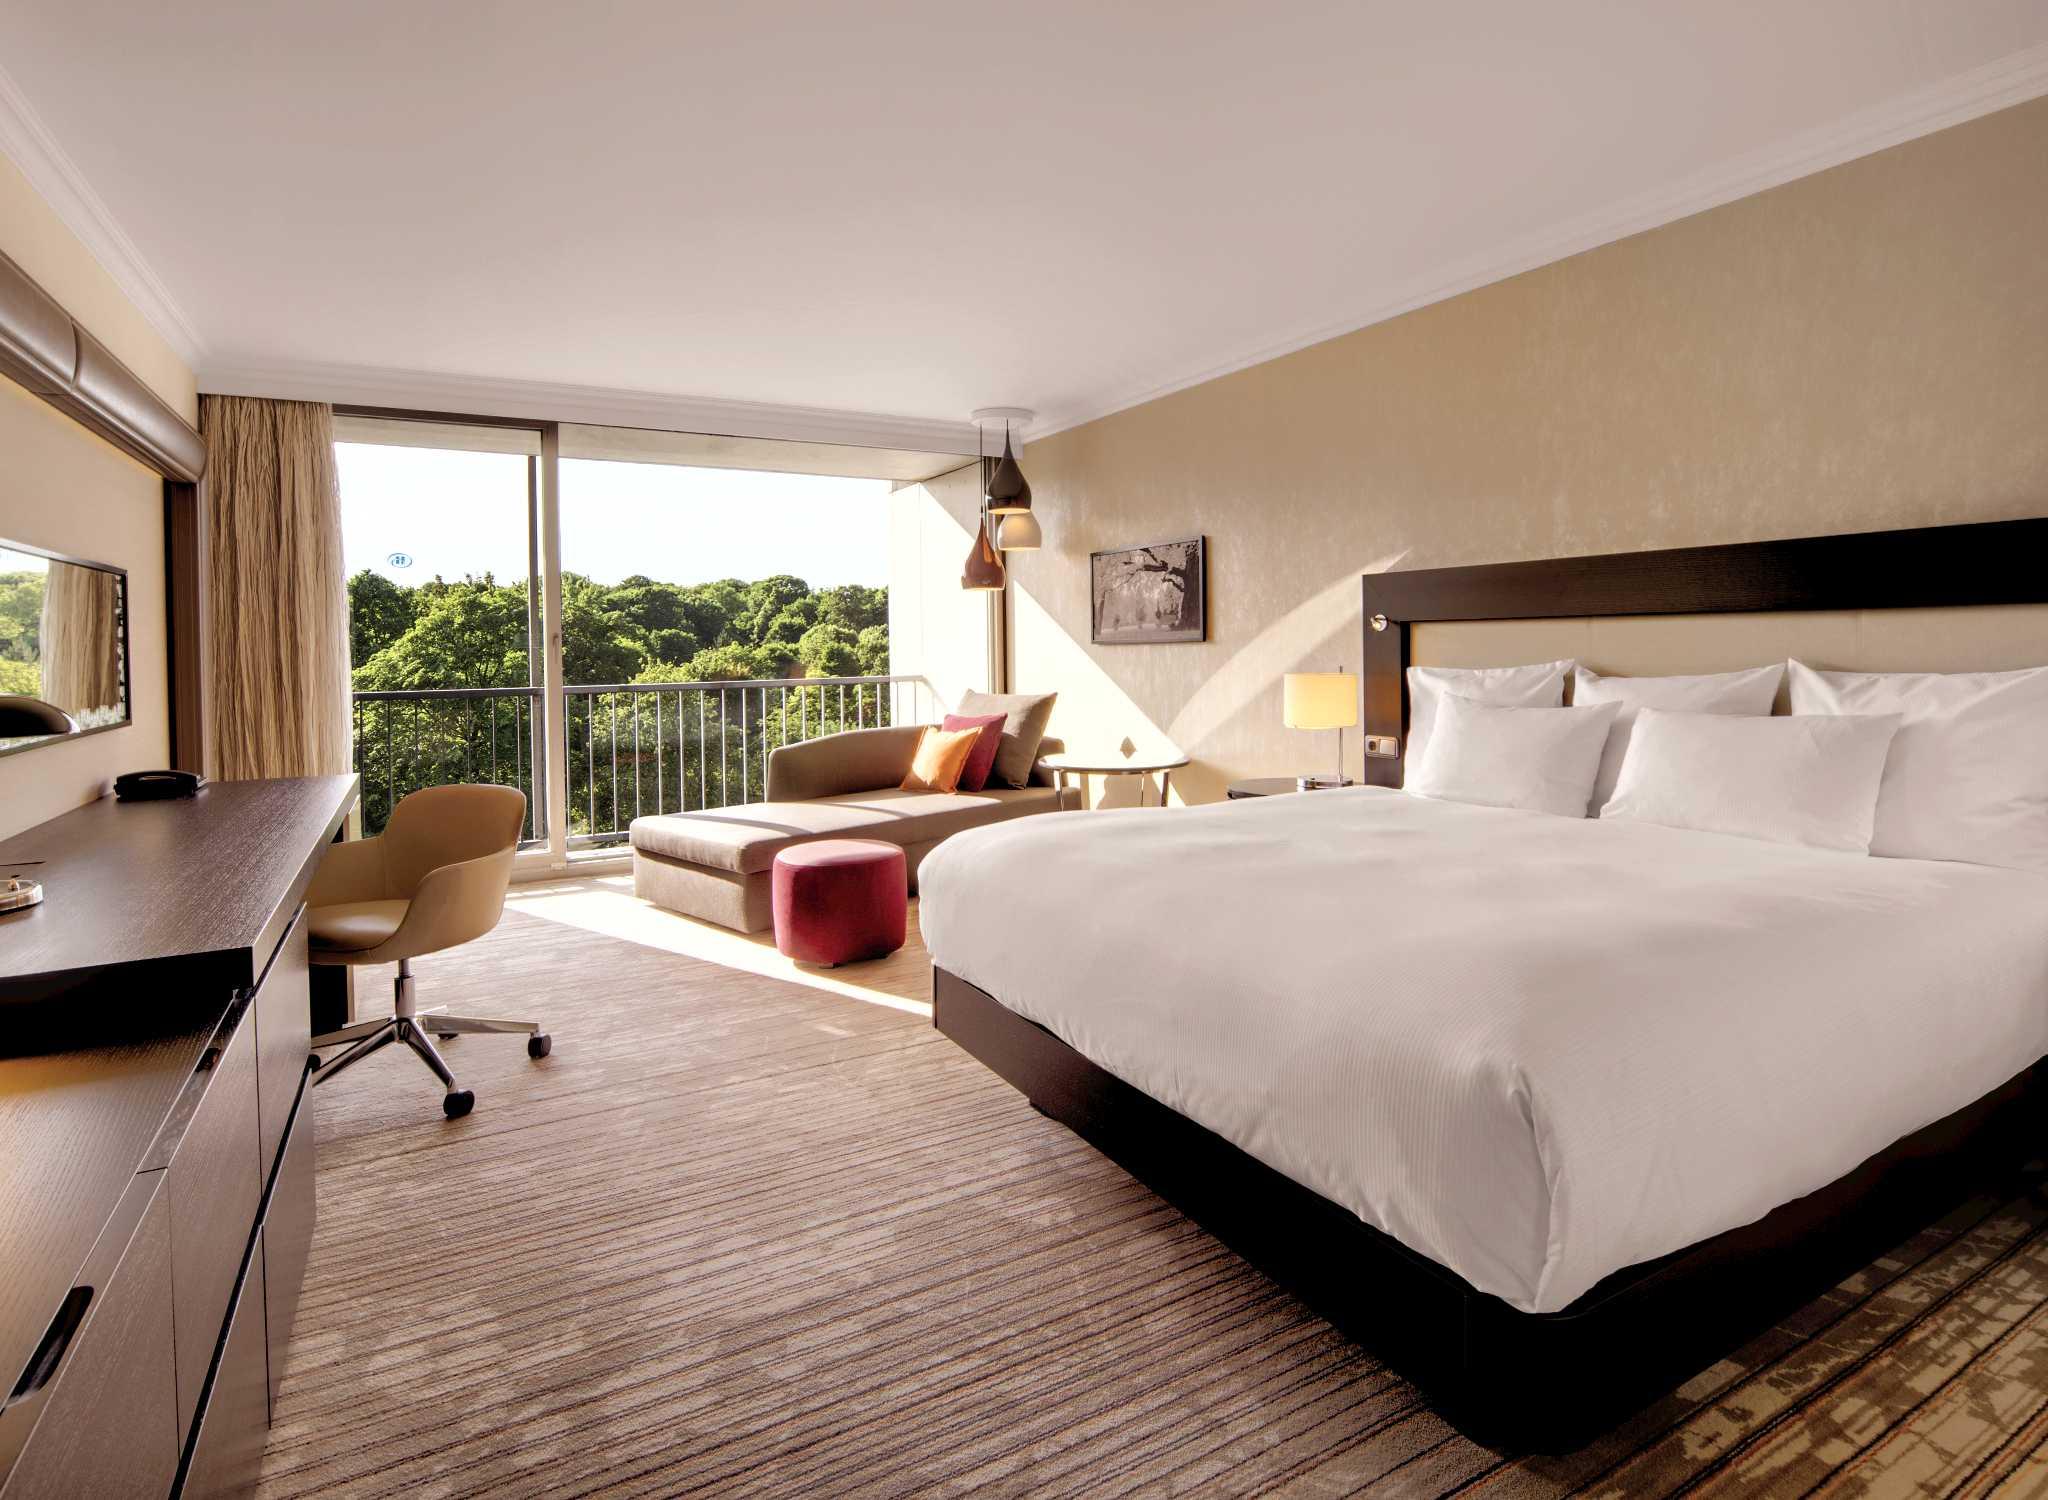 hilton hotel munich park hotel in m nchen duitsland. Black Bedroom Furniture Sets. Home Design Ideas